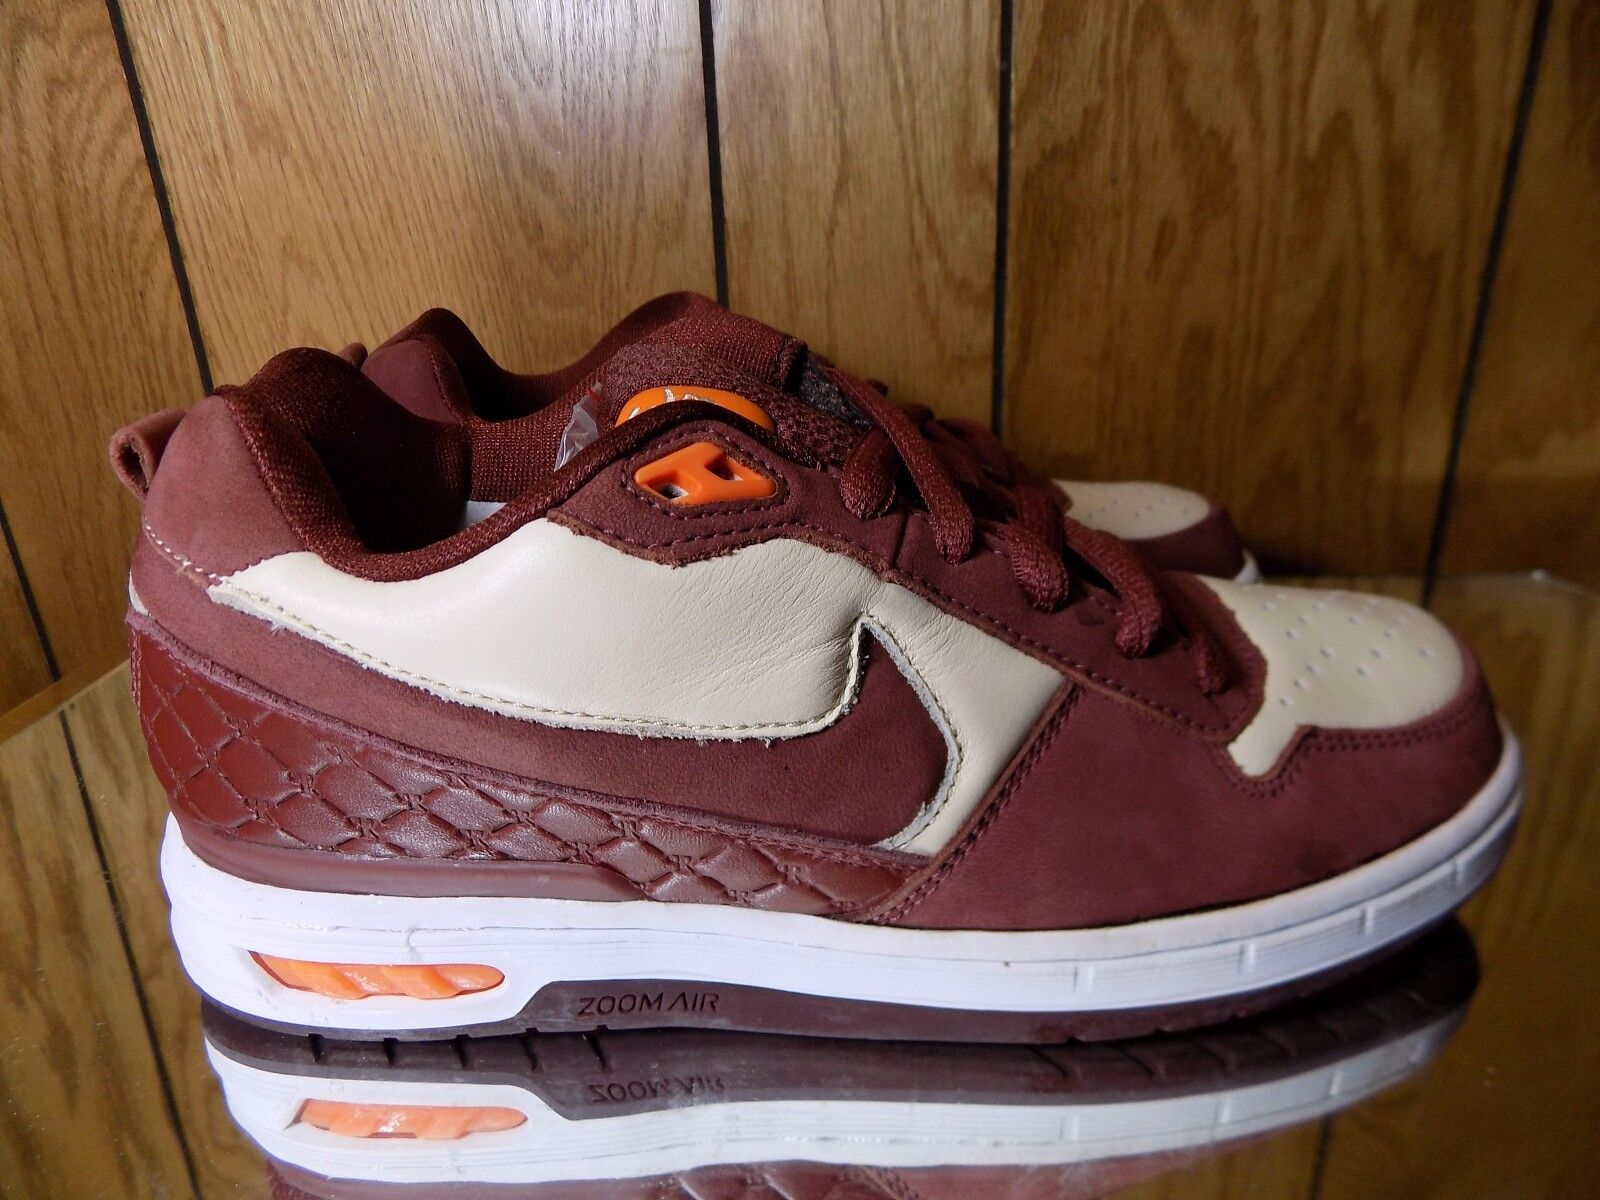 Nike sb sb sb paul rodriguez p-rod 1 dimensioni 6 Marroneee arancione | Vogue  b26e3d